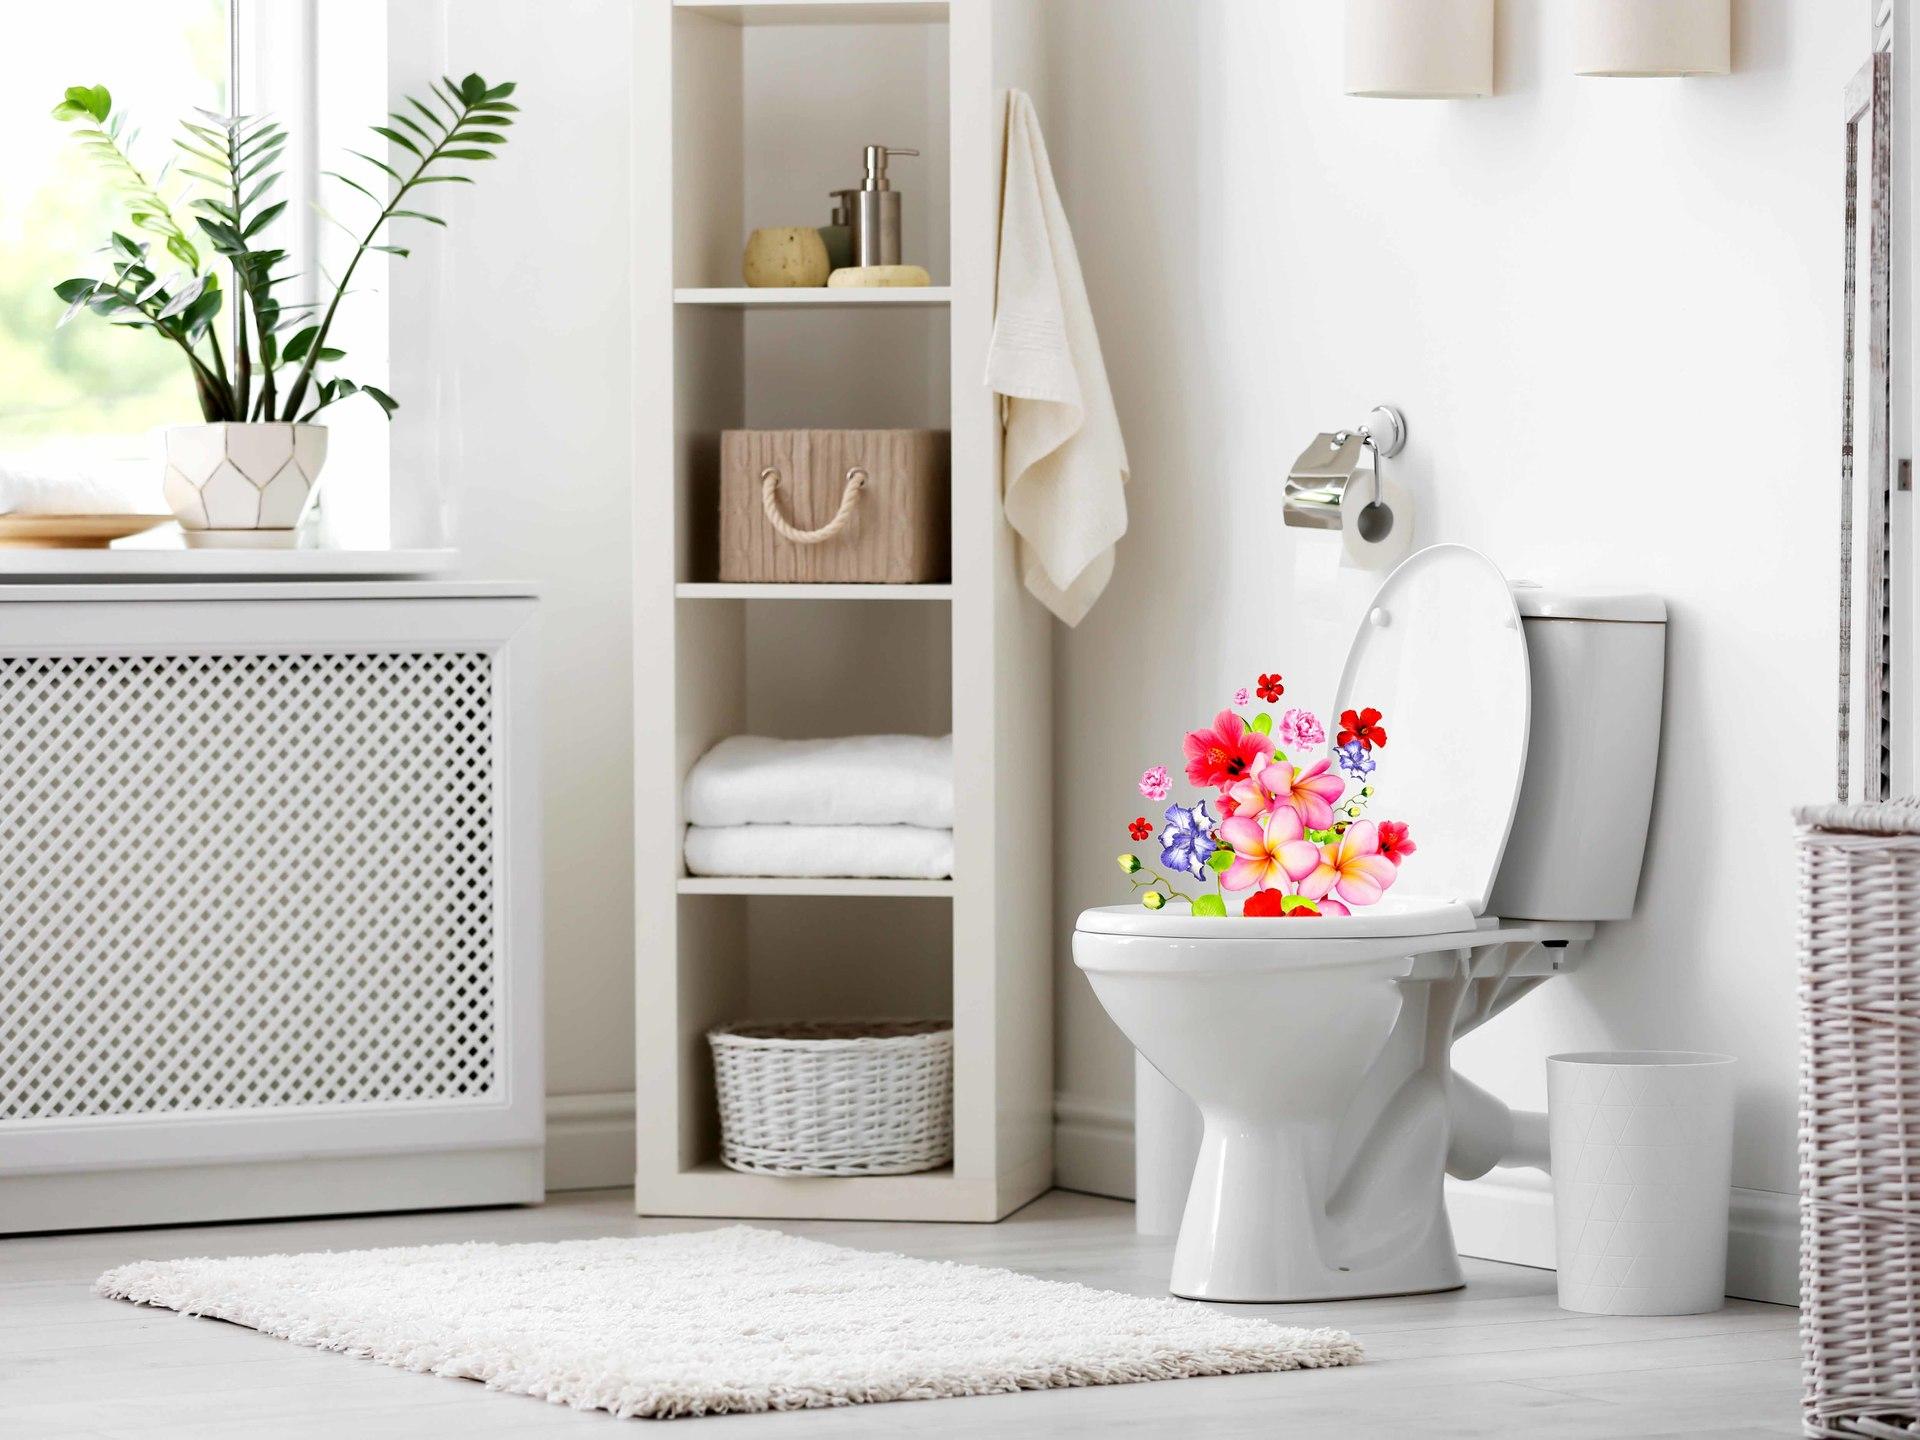 ST0113-TOILET Supergel intenzívny čistič na toalety, bidety a pisoáre Atlantic Ocean